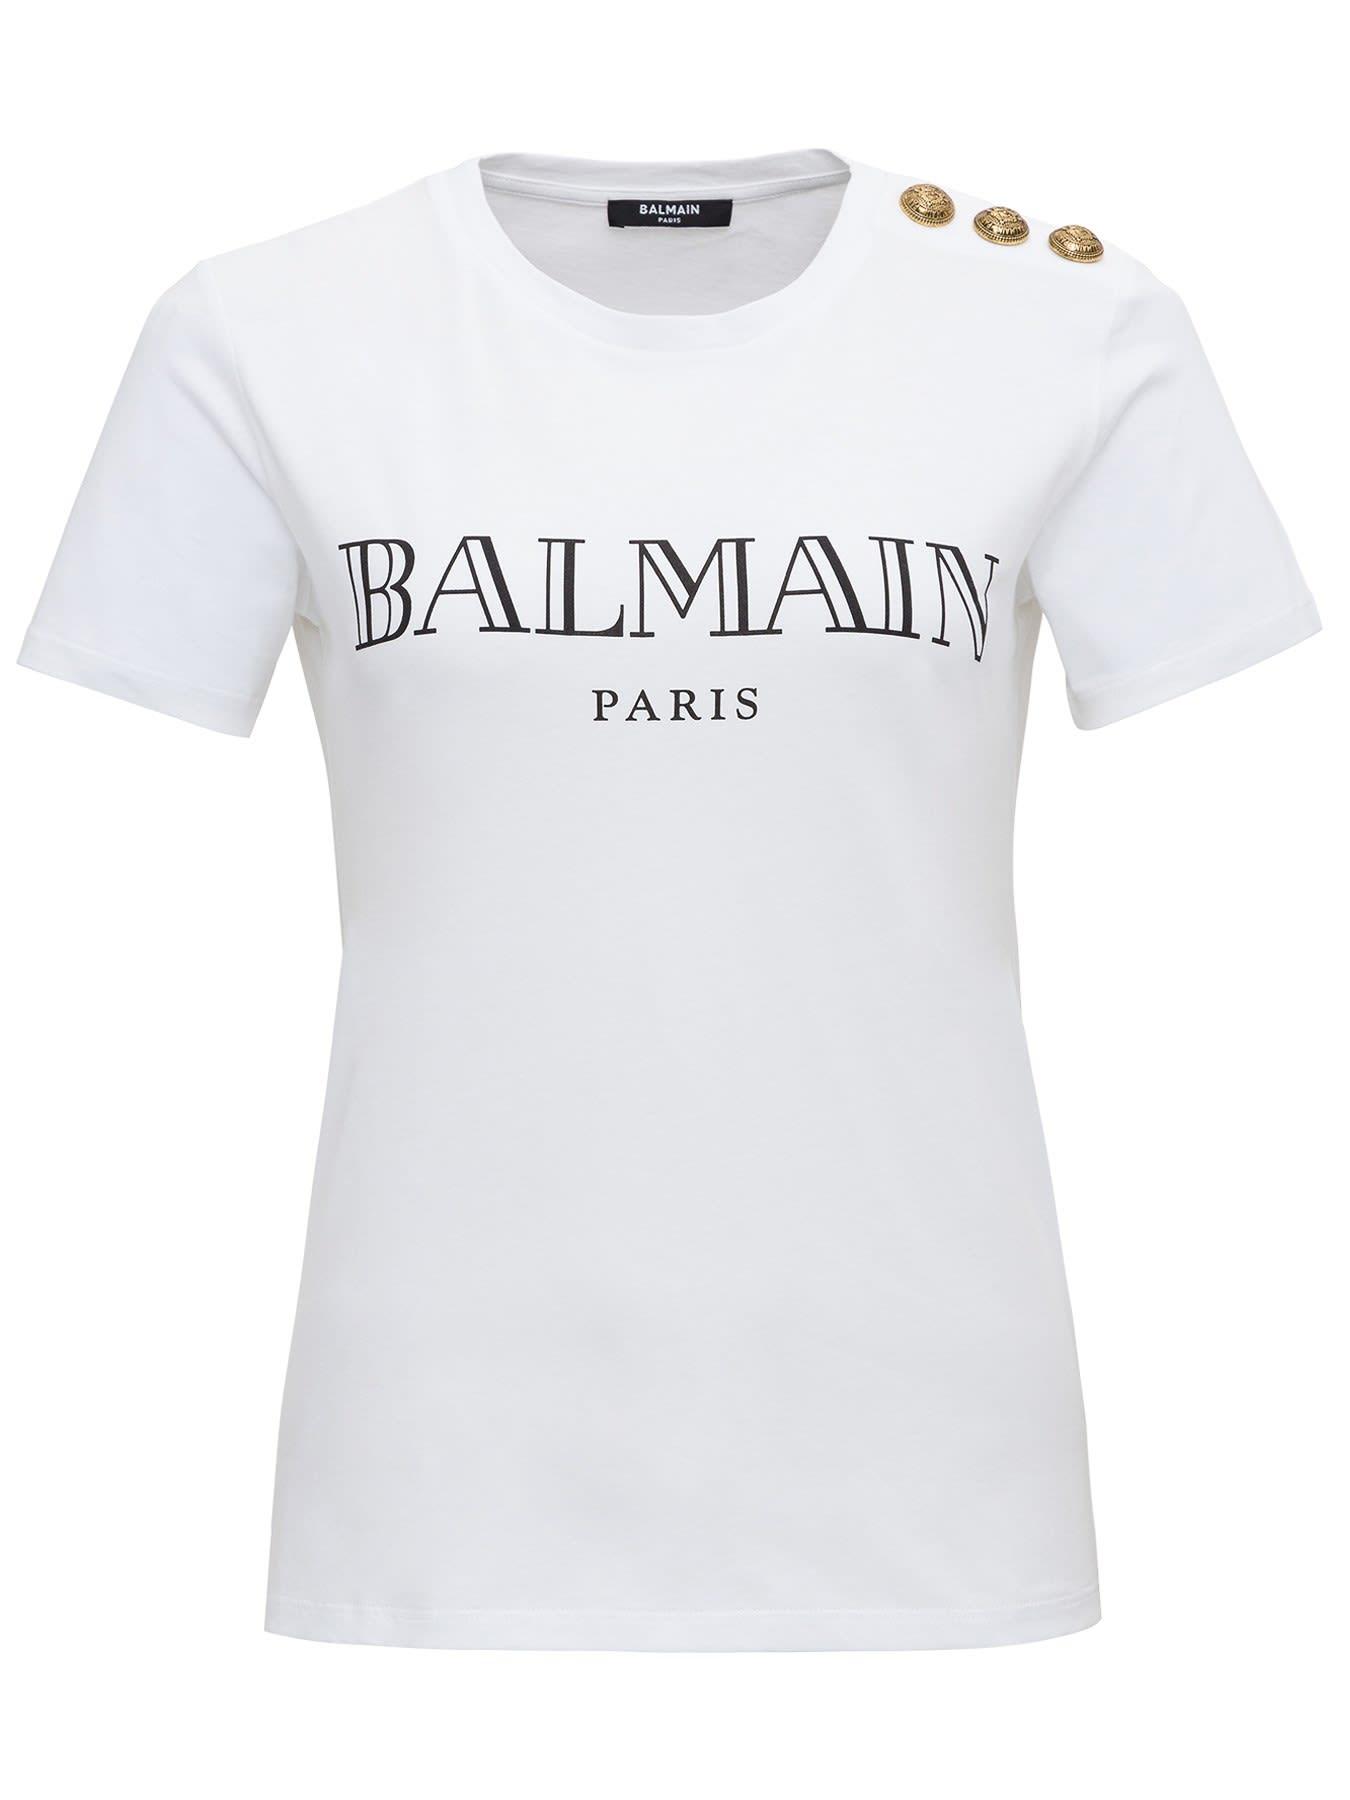 Balmain Tee With Logo